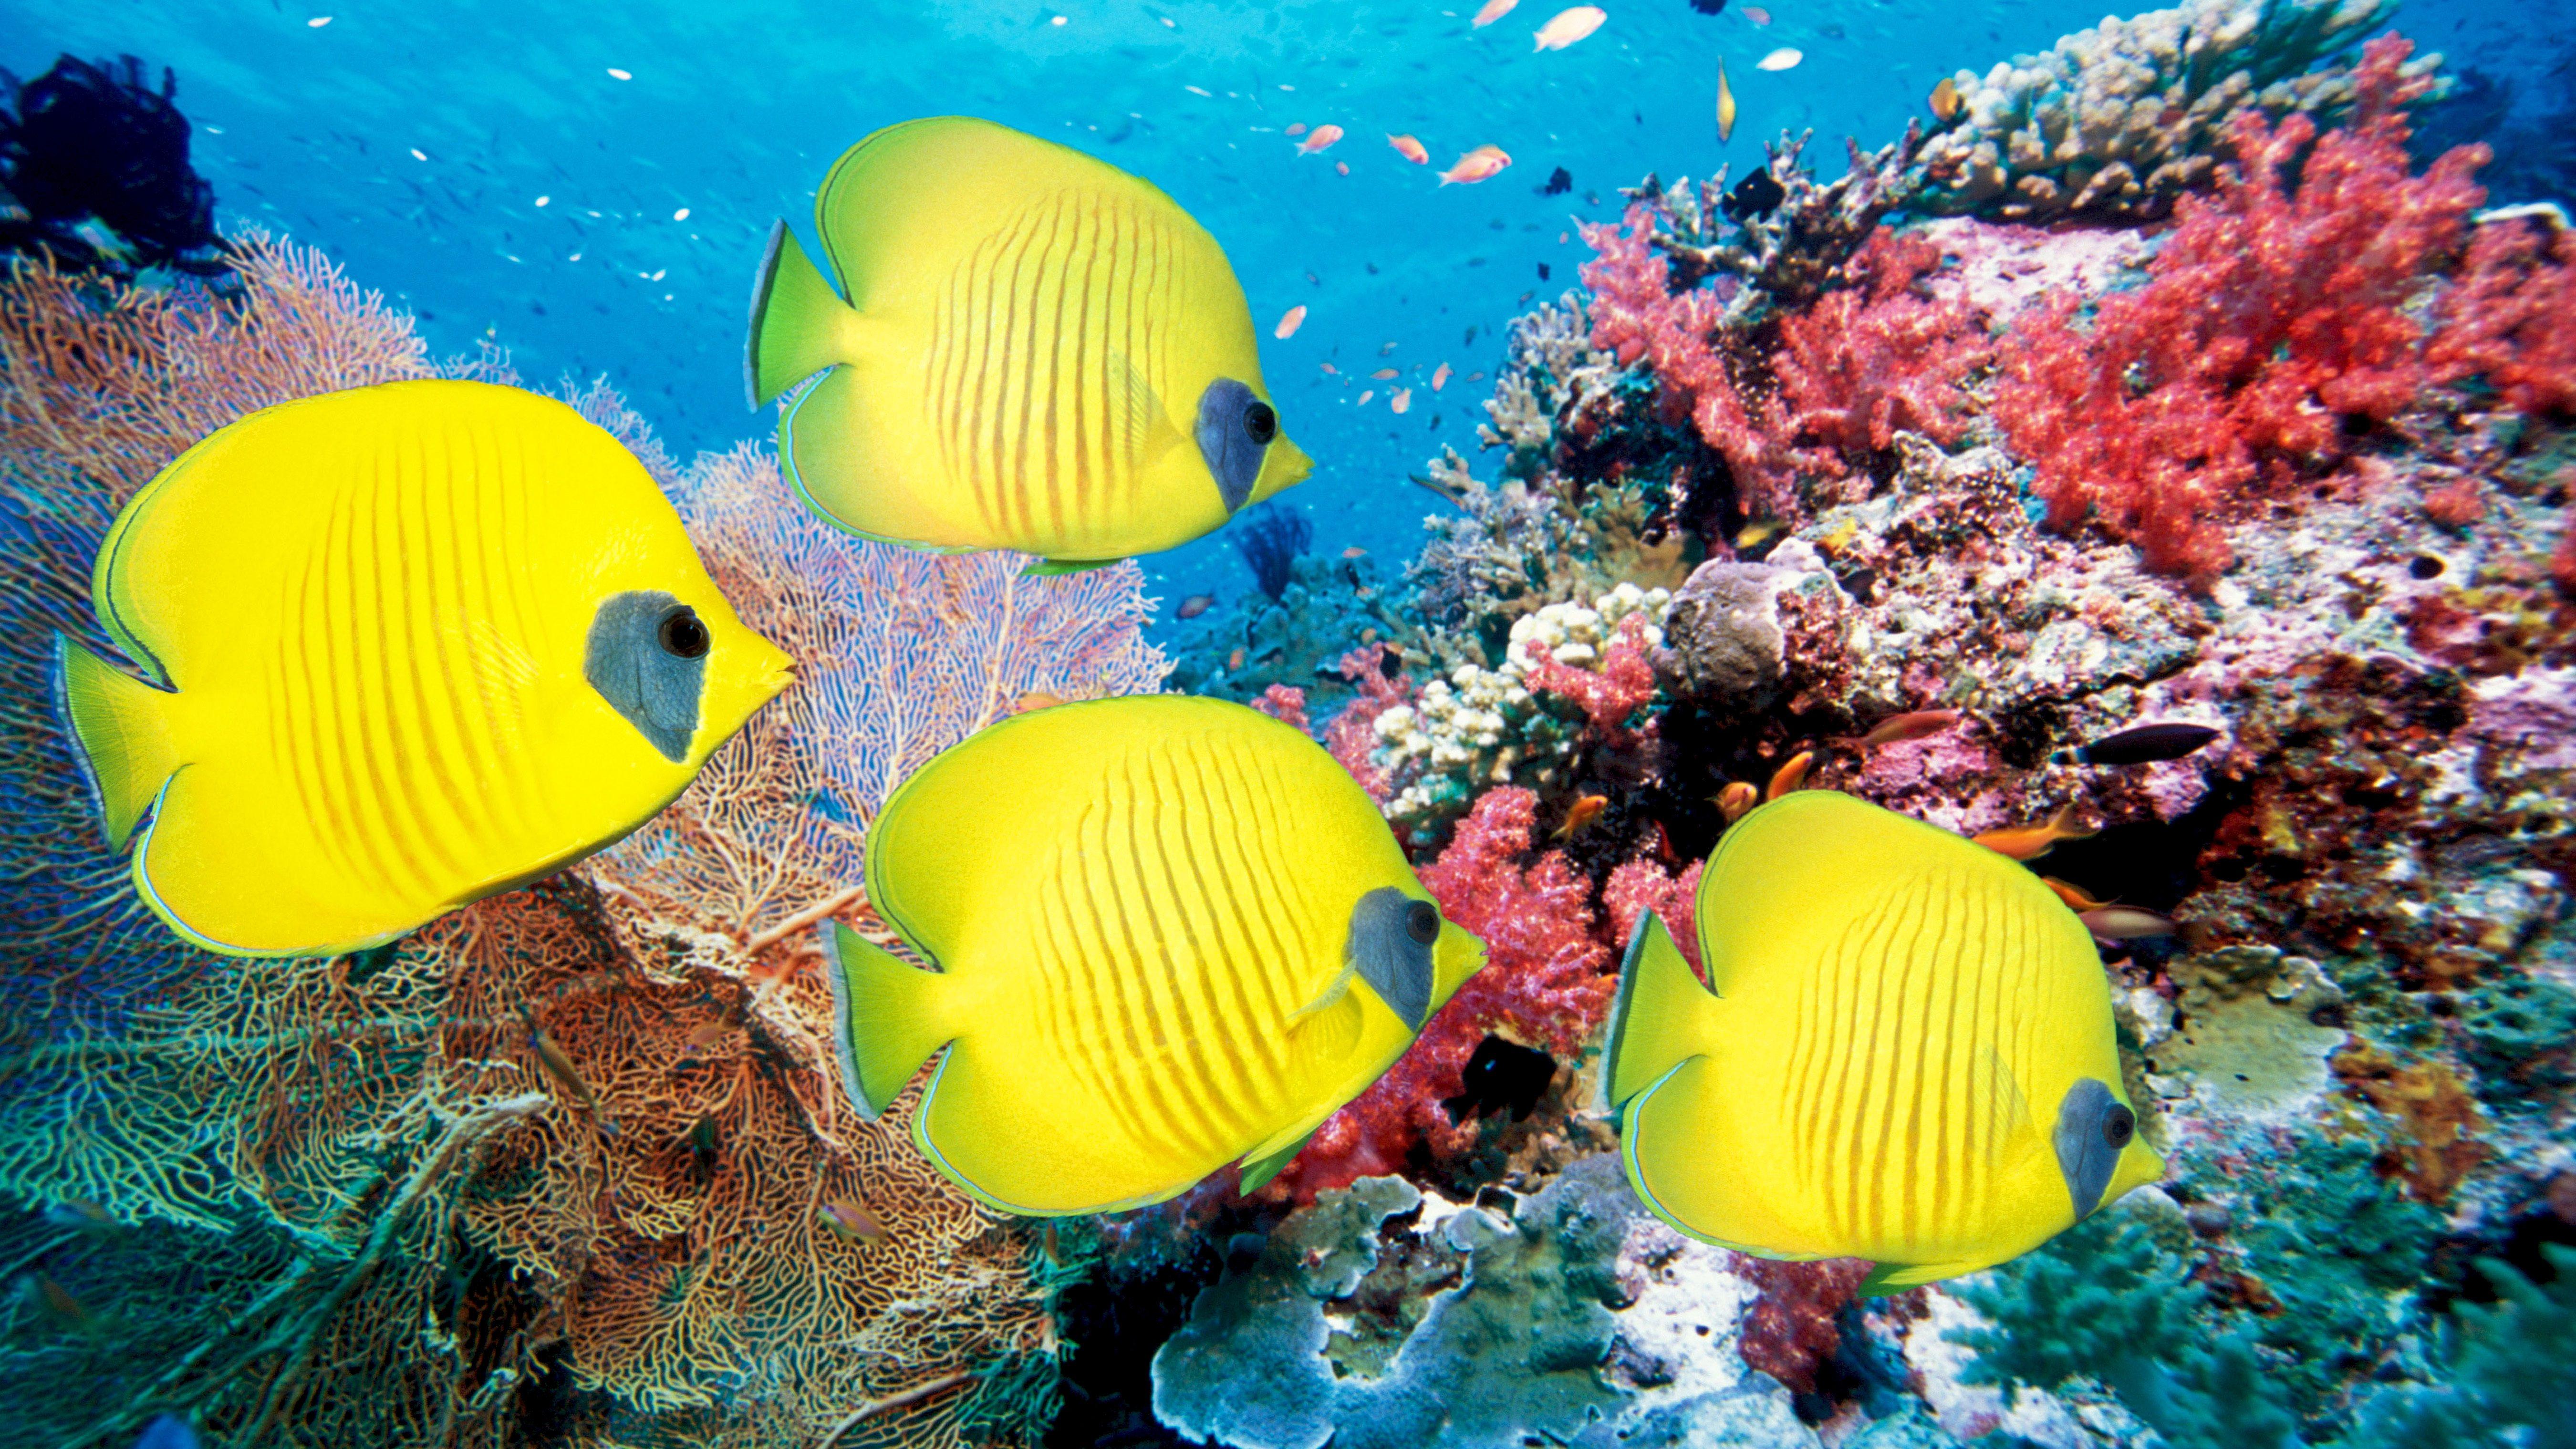 desktop wallpaper of coral fish wallpaper of colorful underwater 5400x3038